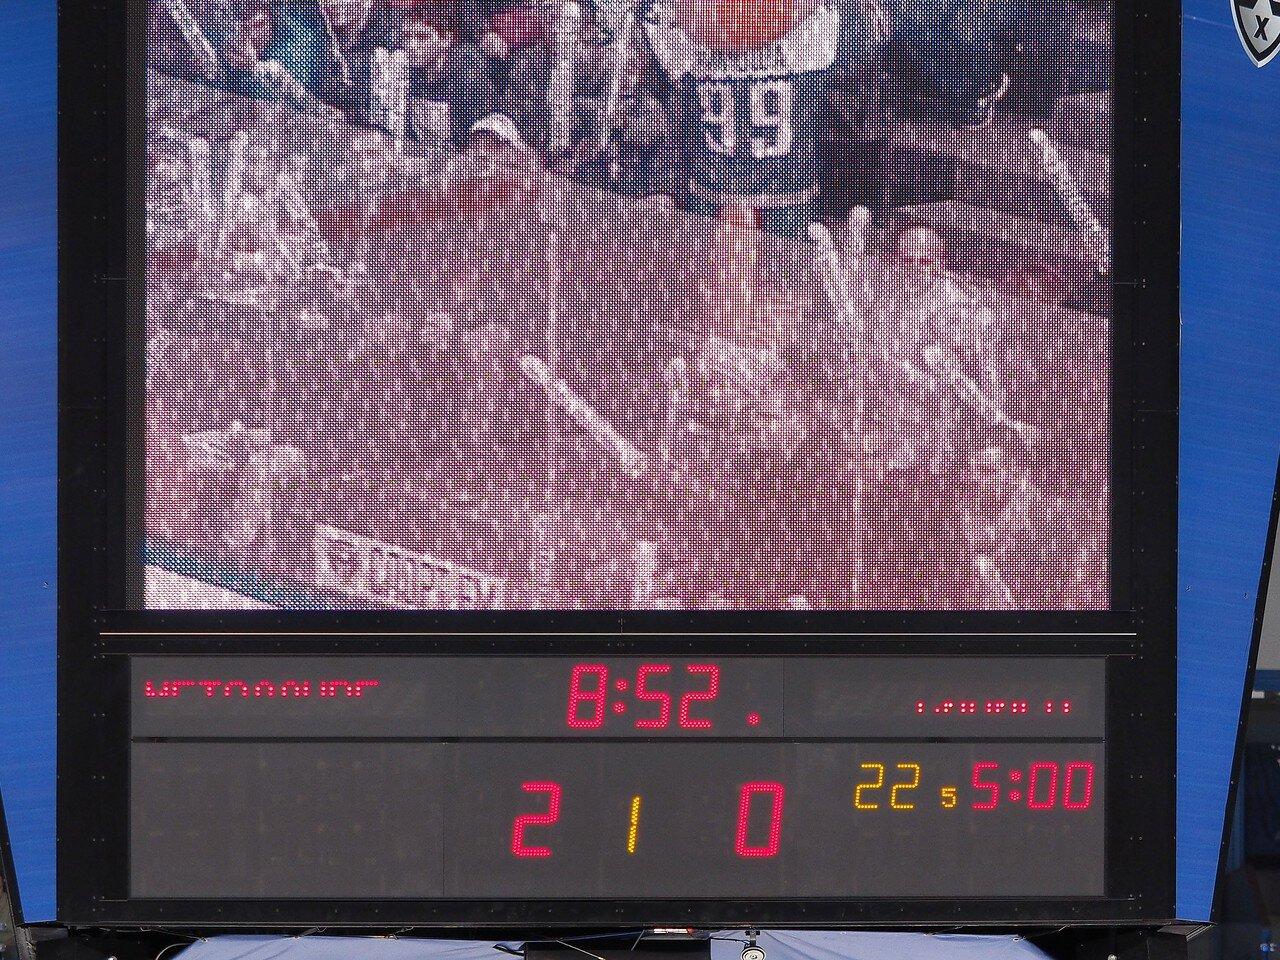 78Восток 1/2 плей-офф Металлург - Сибирь 08.03.2016